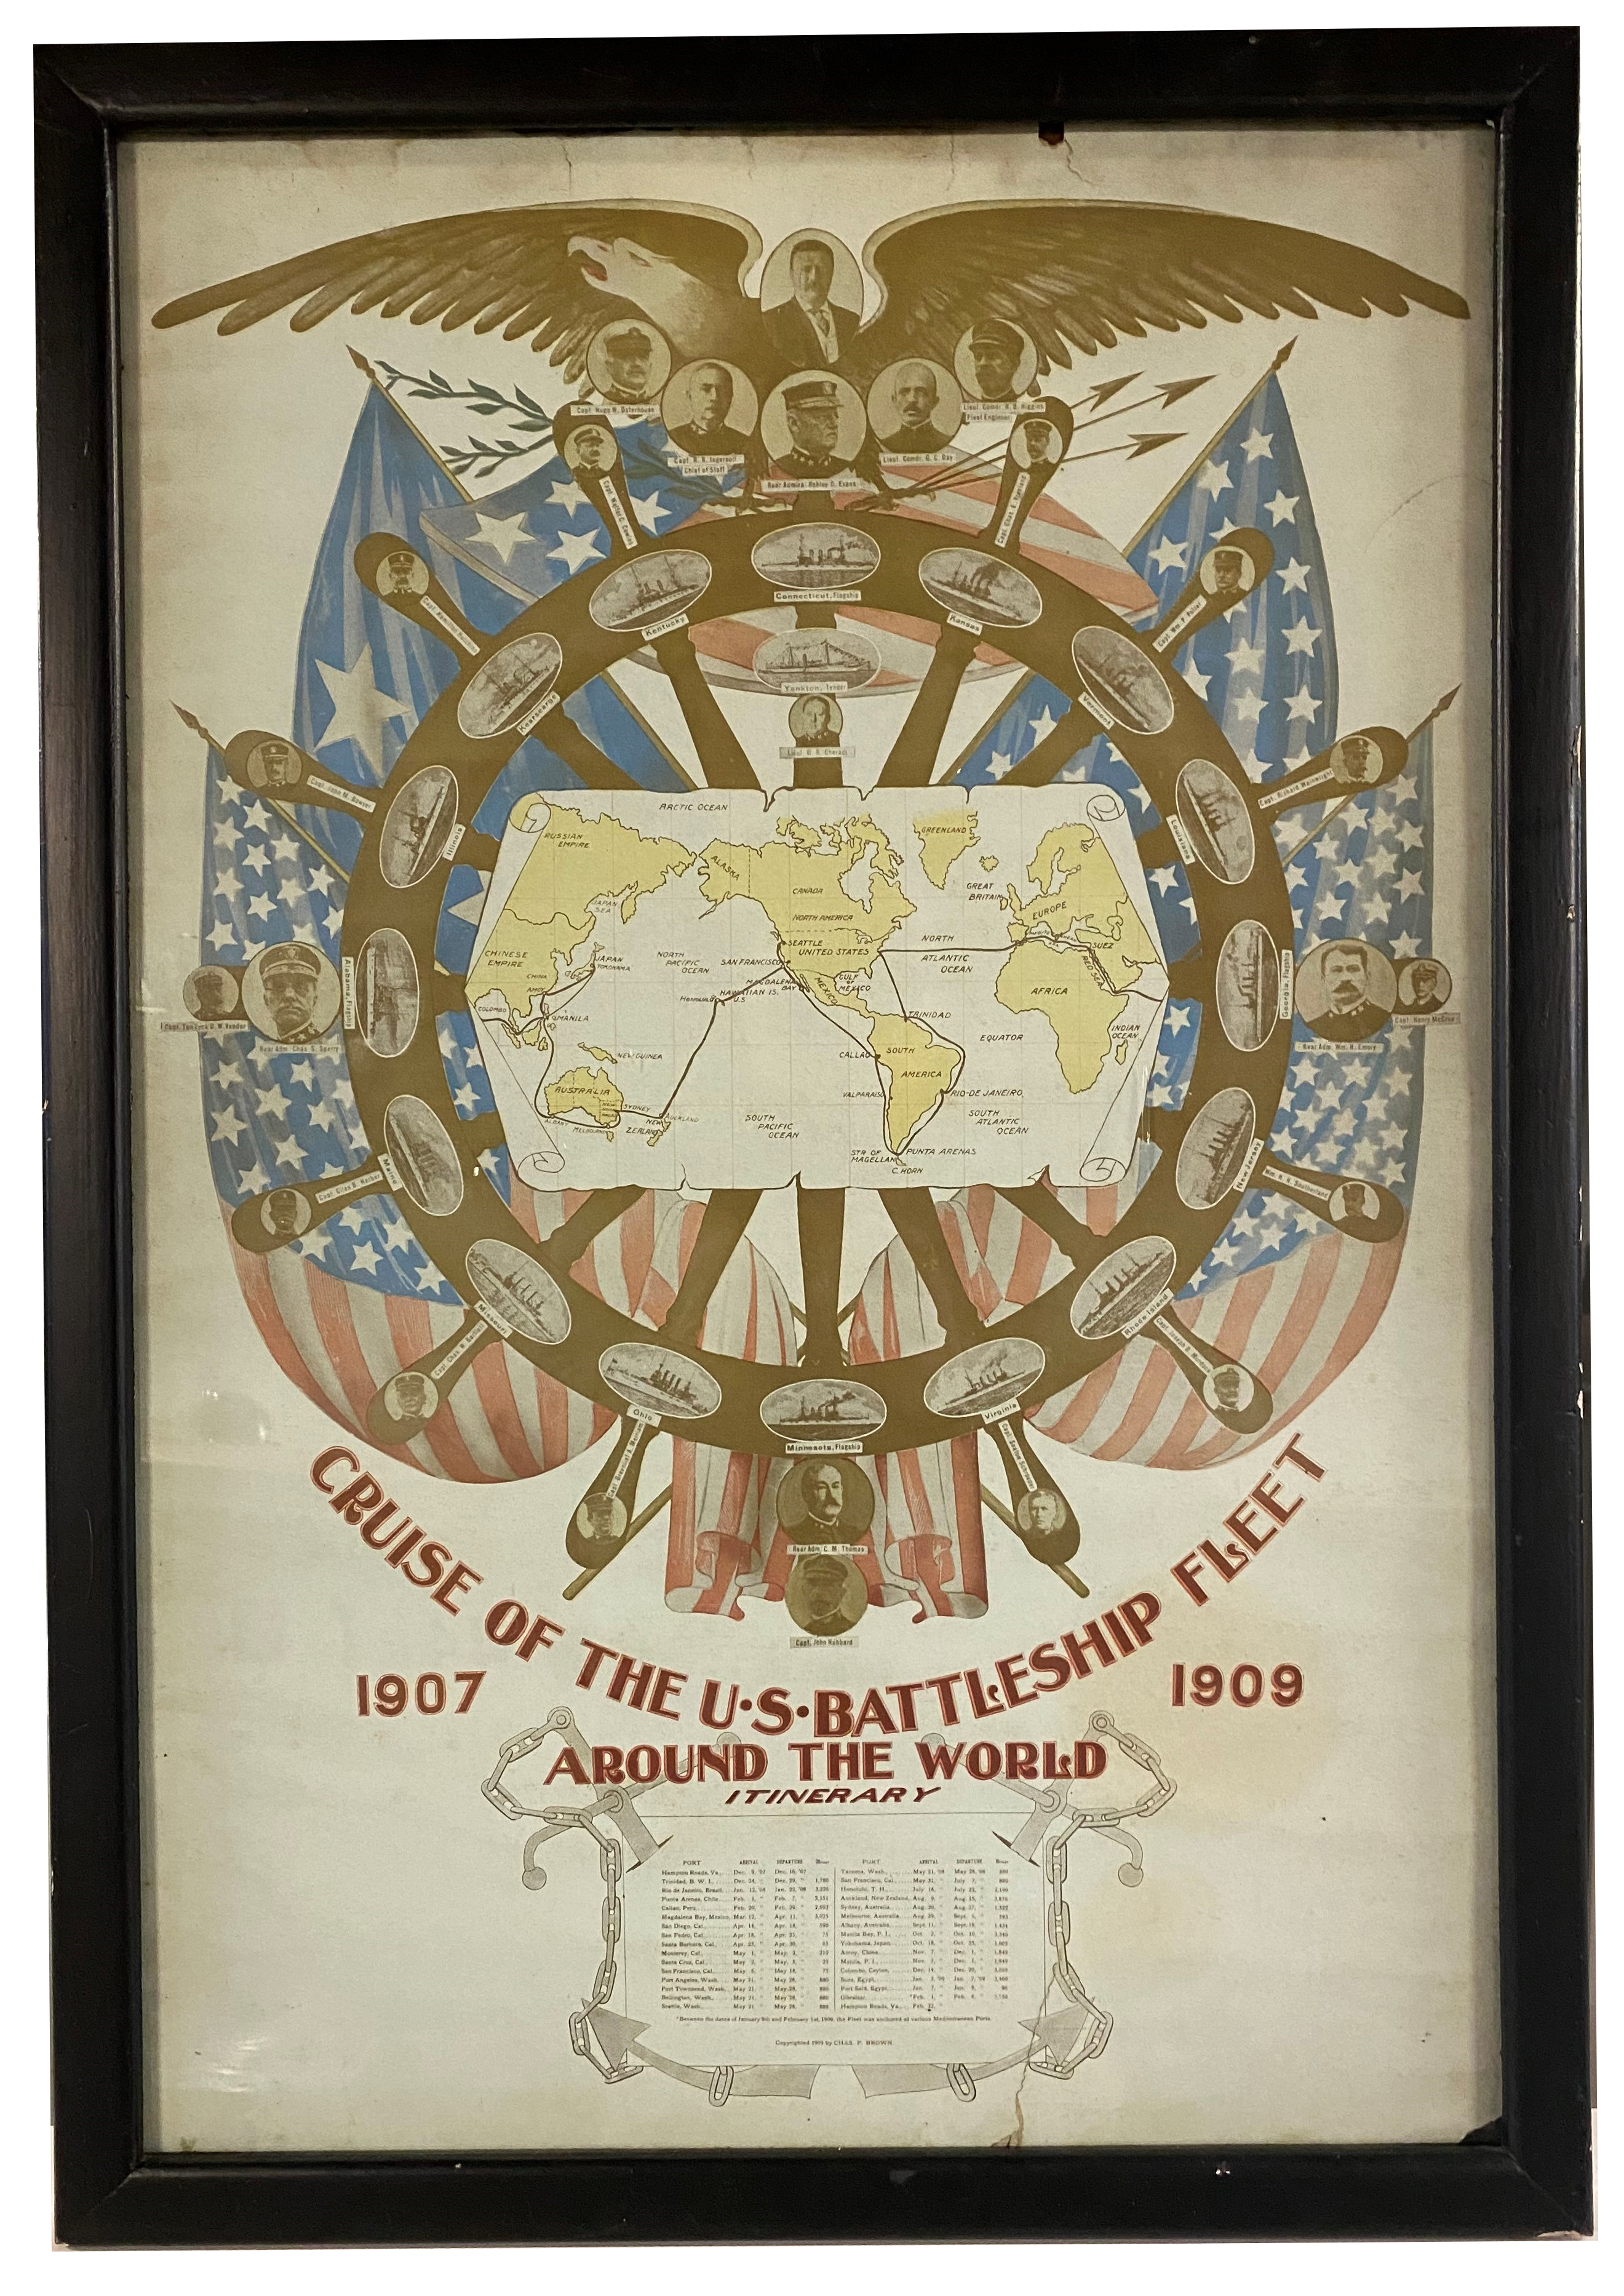 Cruise of the U.S. Battleship Fleet Poster